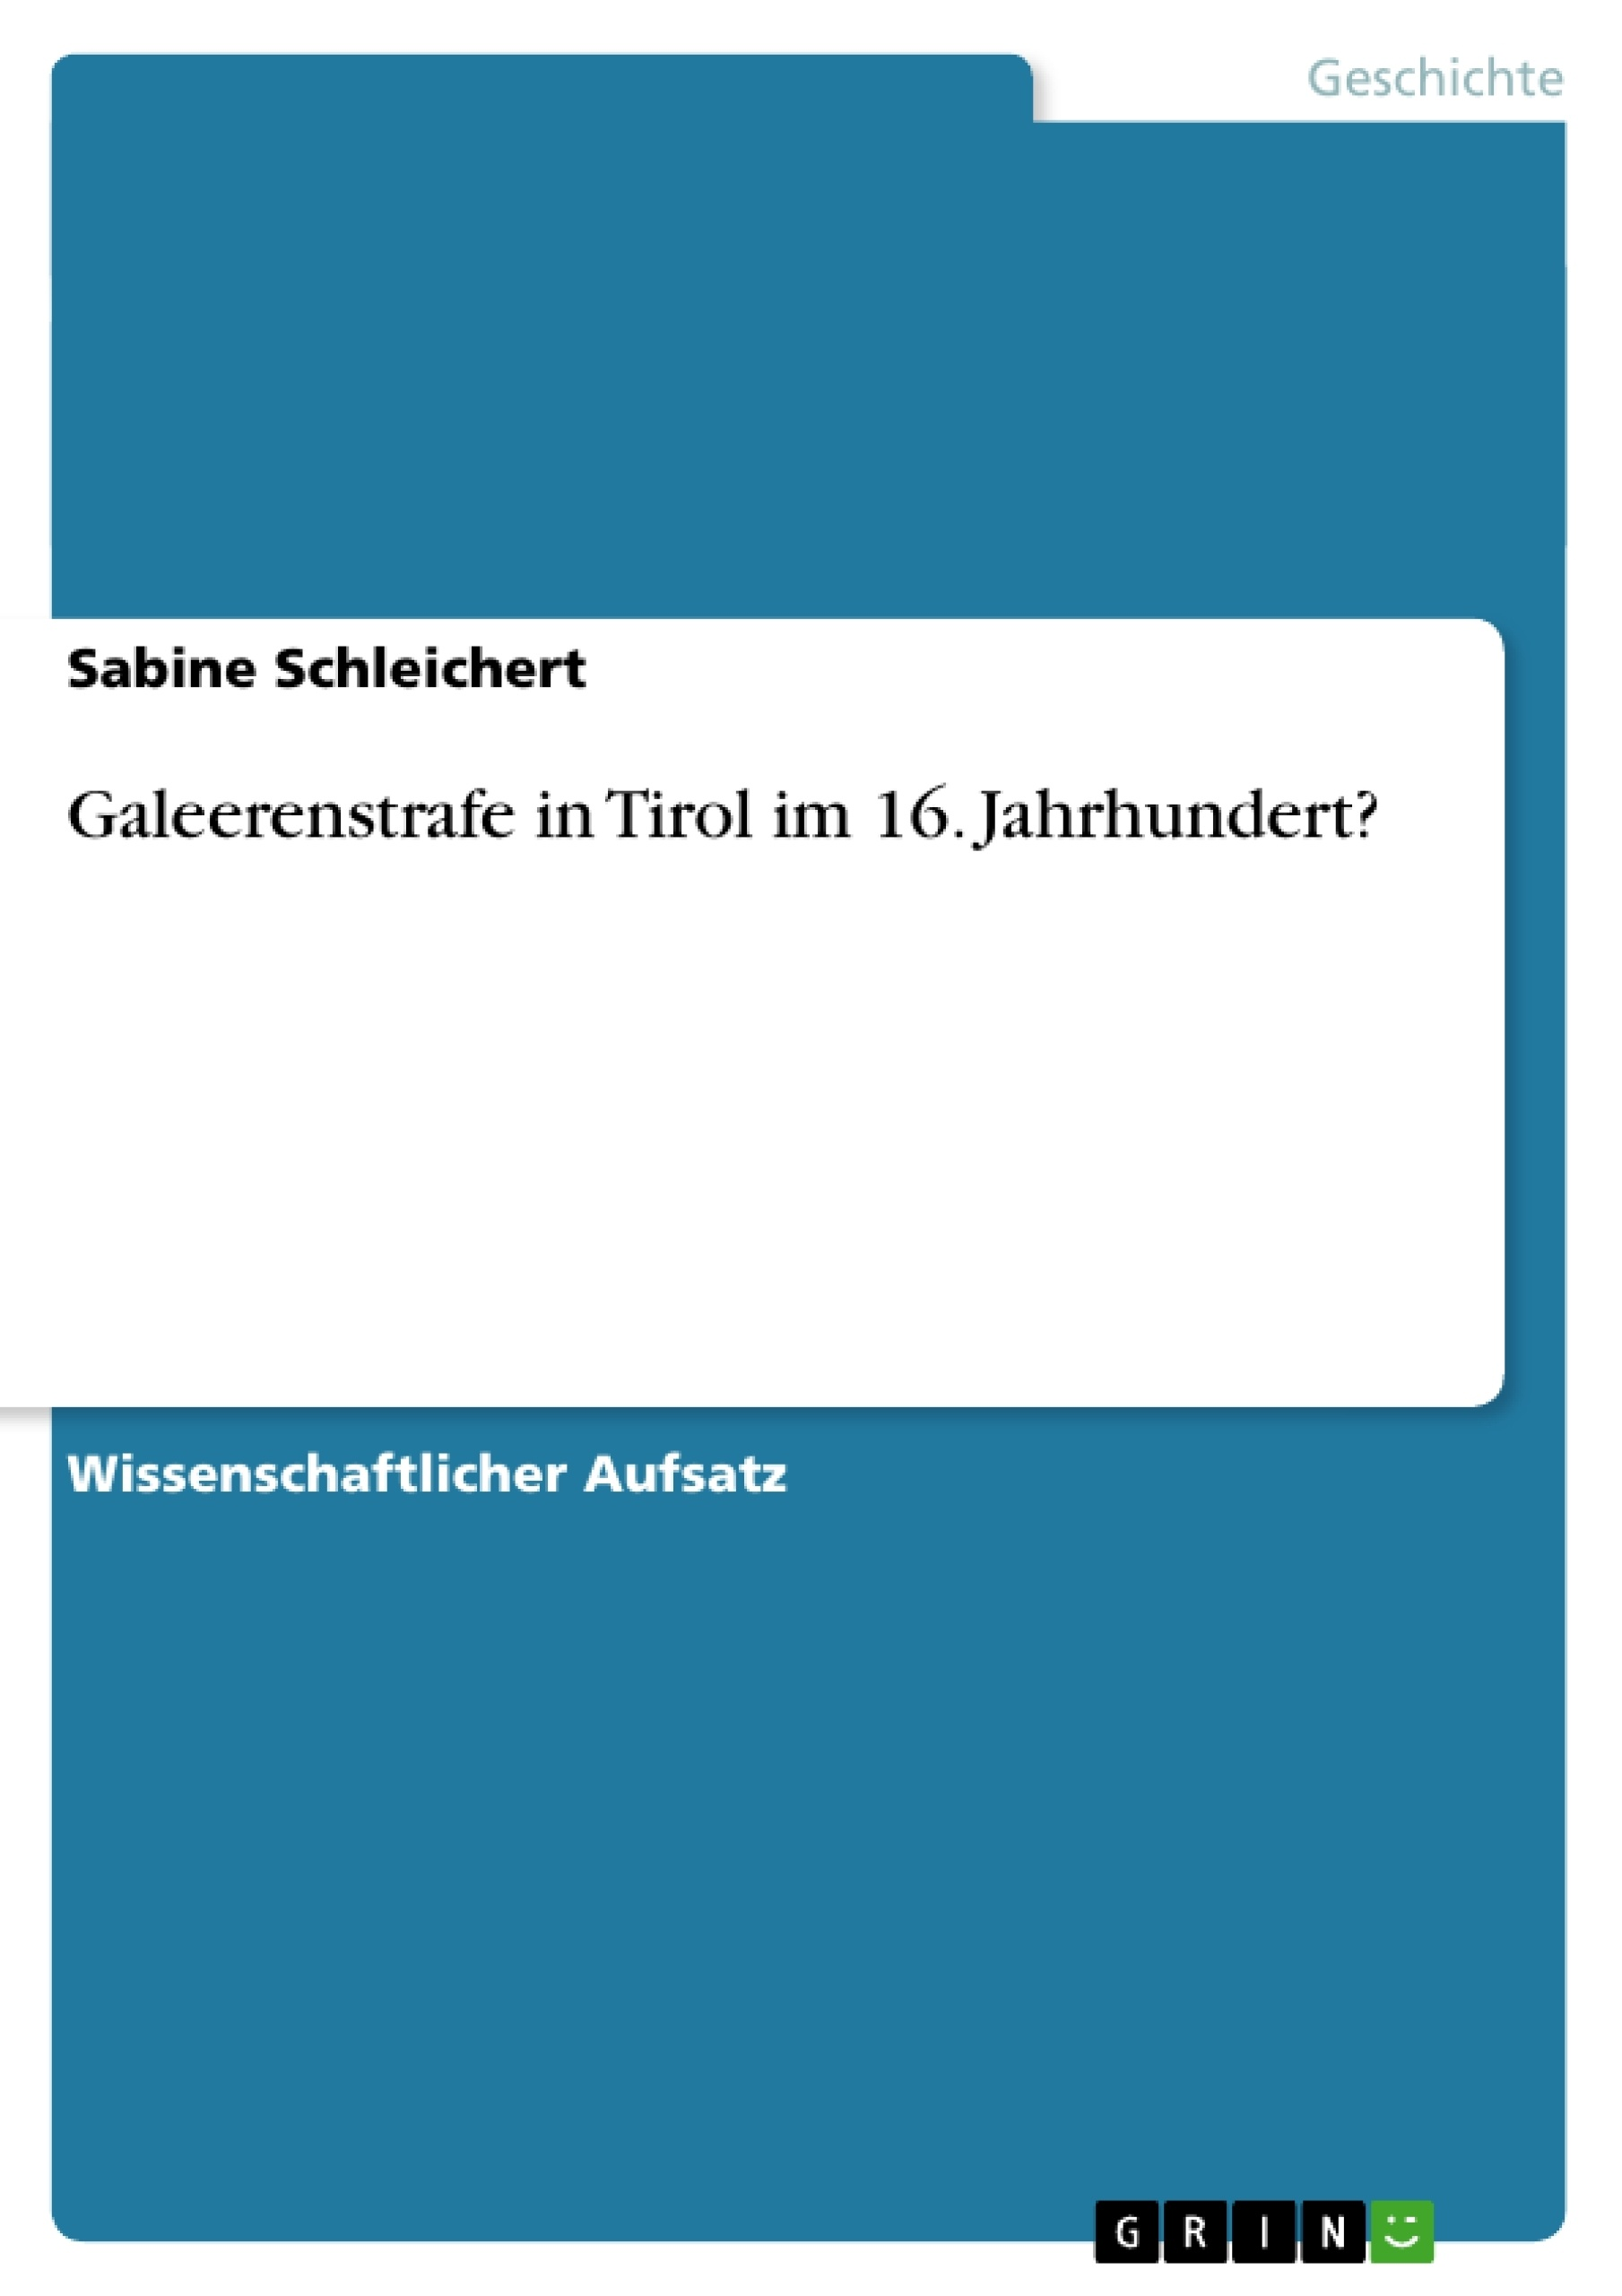 Titel: Galeerenstrafe in Tirol im 16. Jahrhundert?